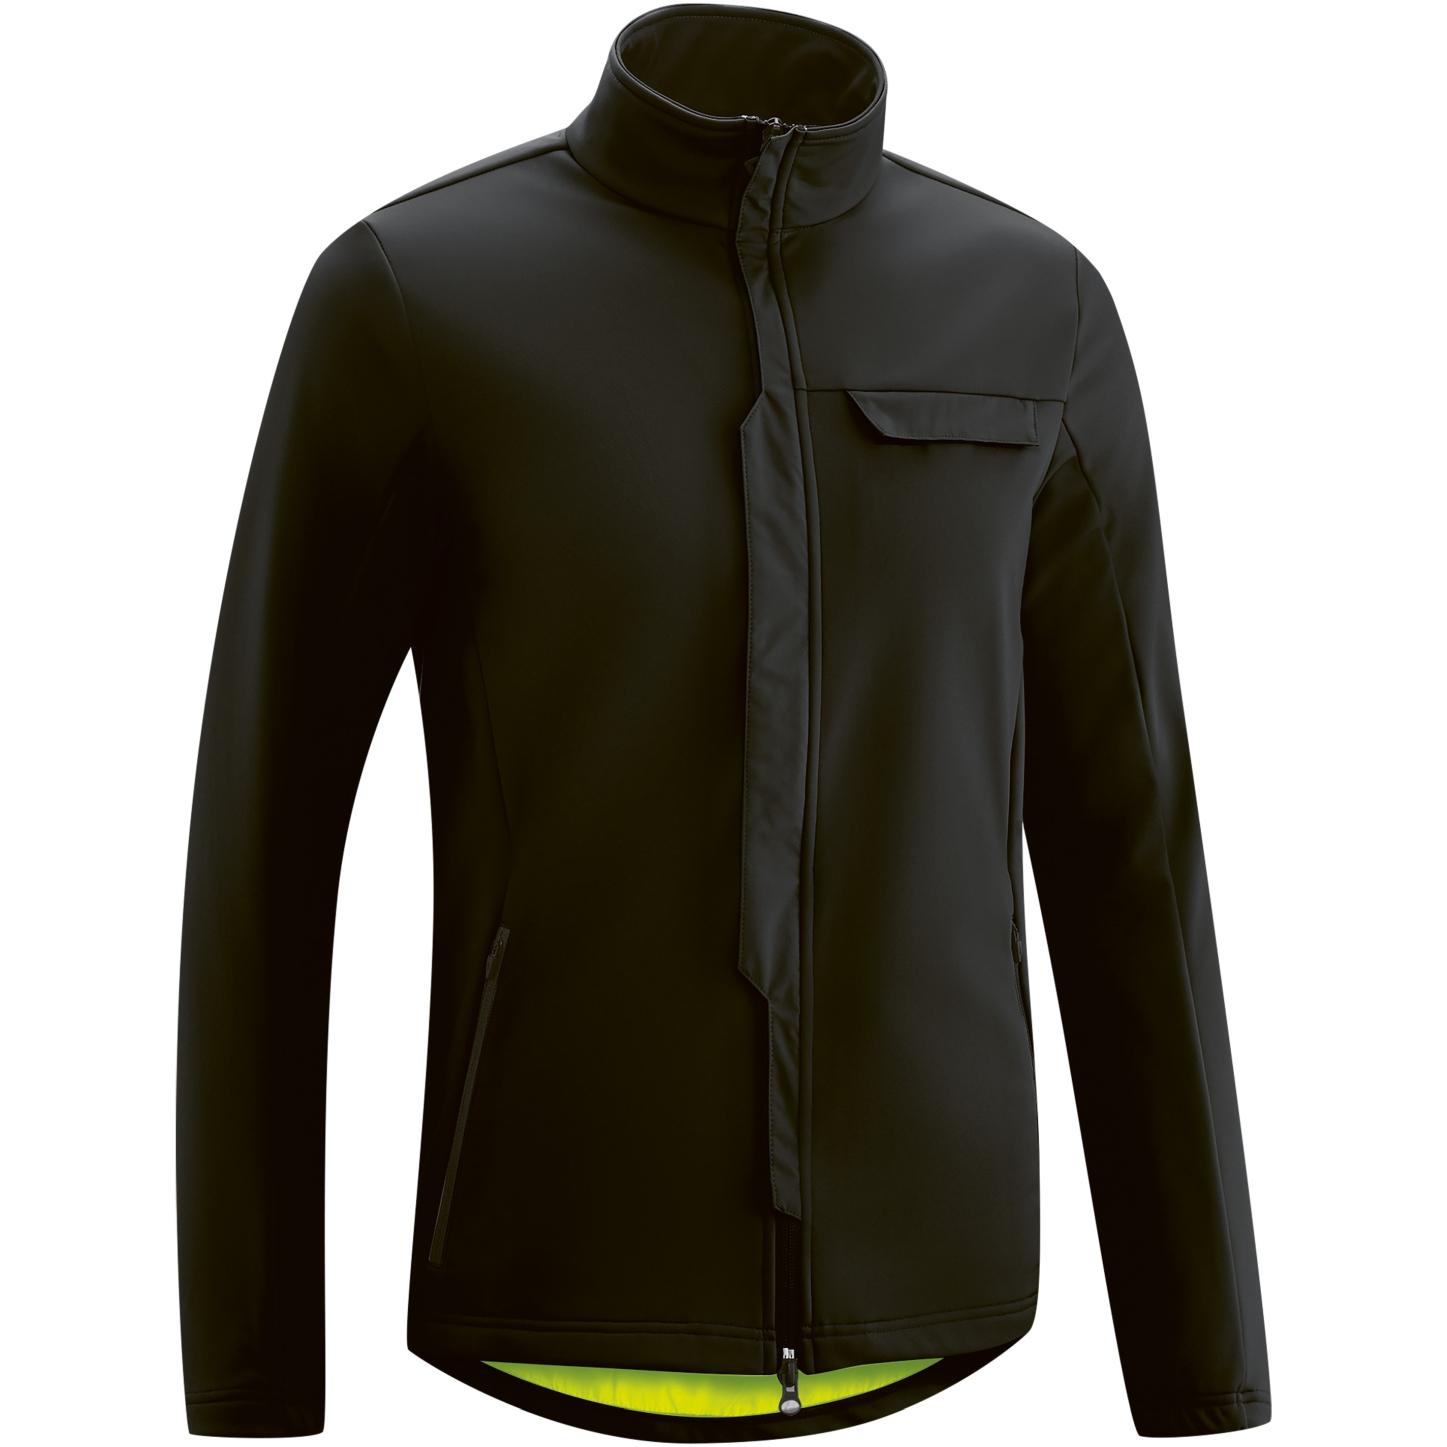 Gonso Ternes Men's Softshell Jacket - Black